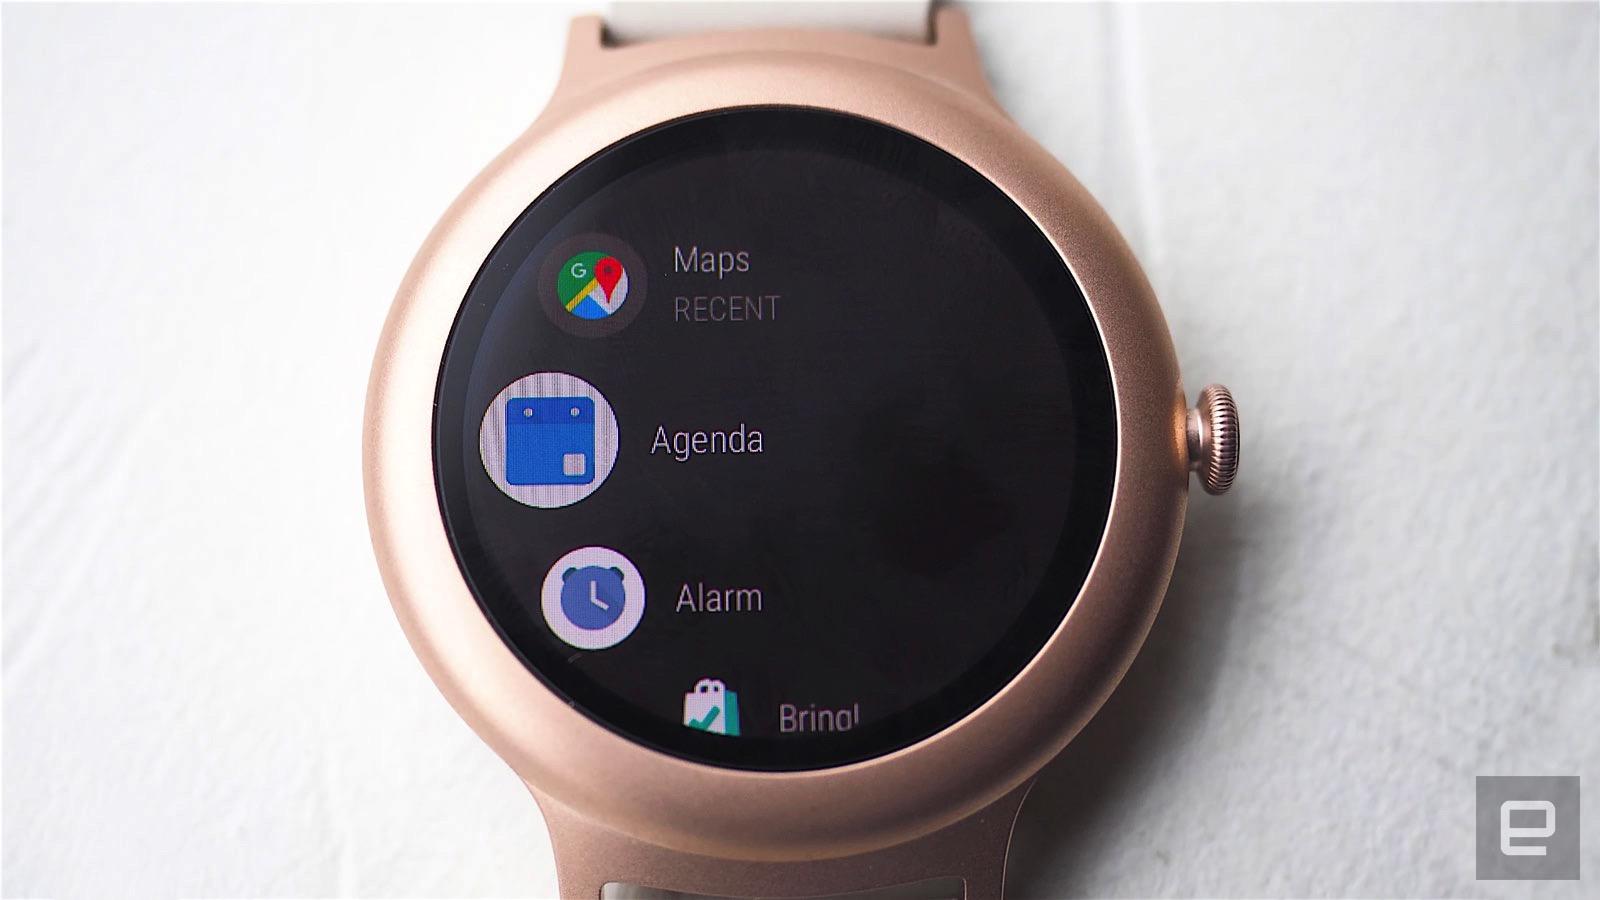 Bug 已被消灭:Android Wear 2.0 更新推送继续-芊雅企服